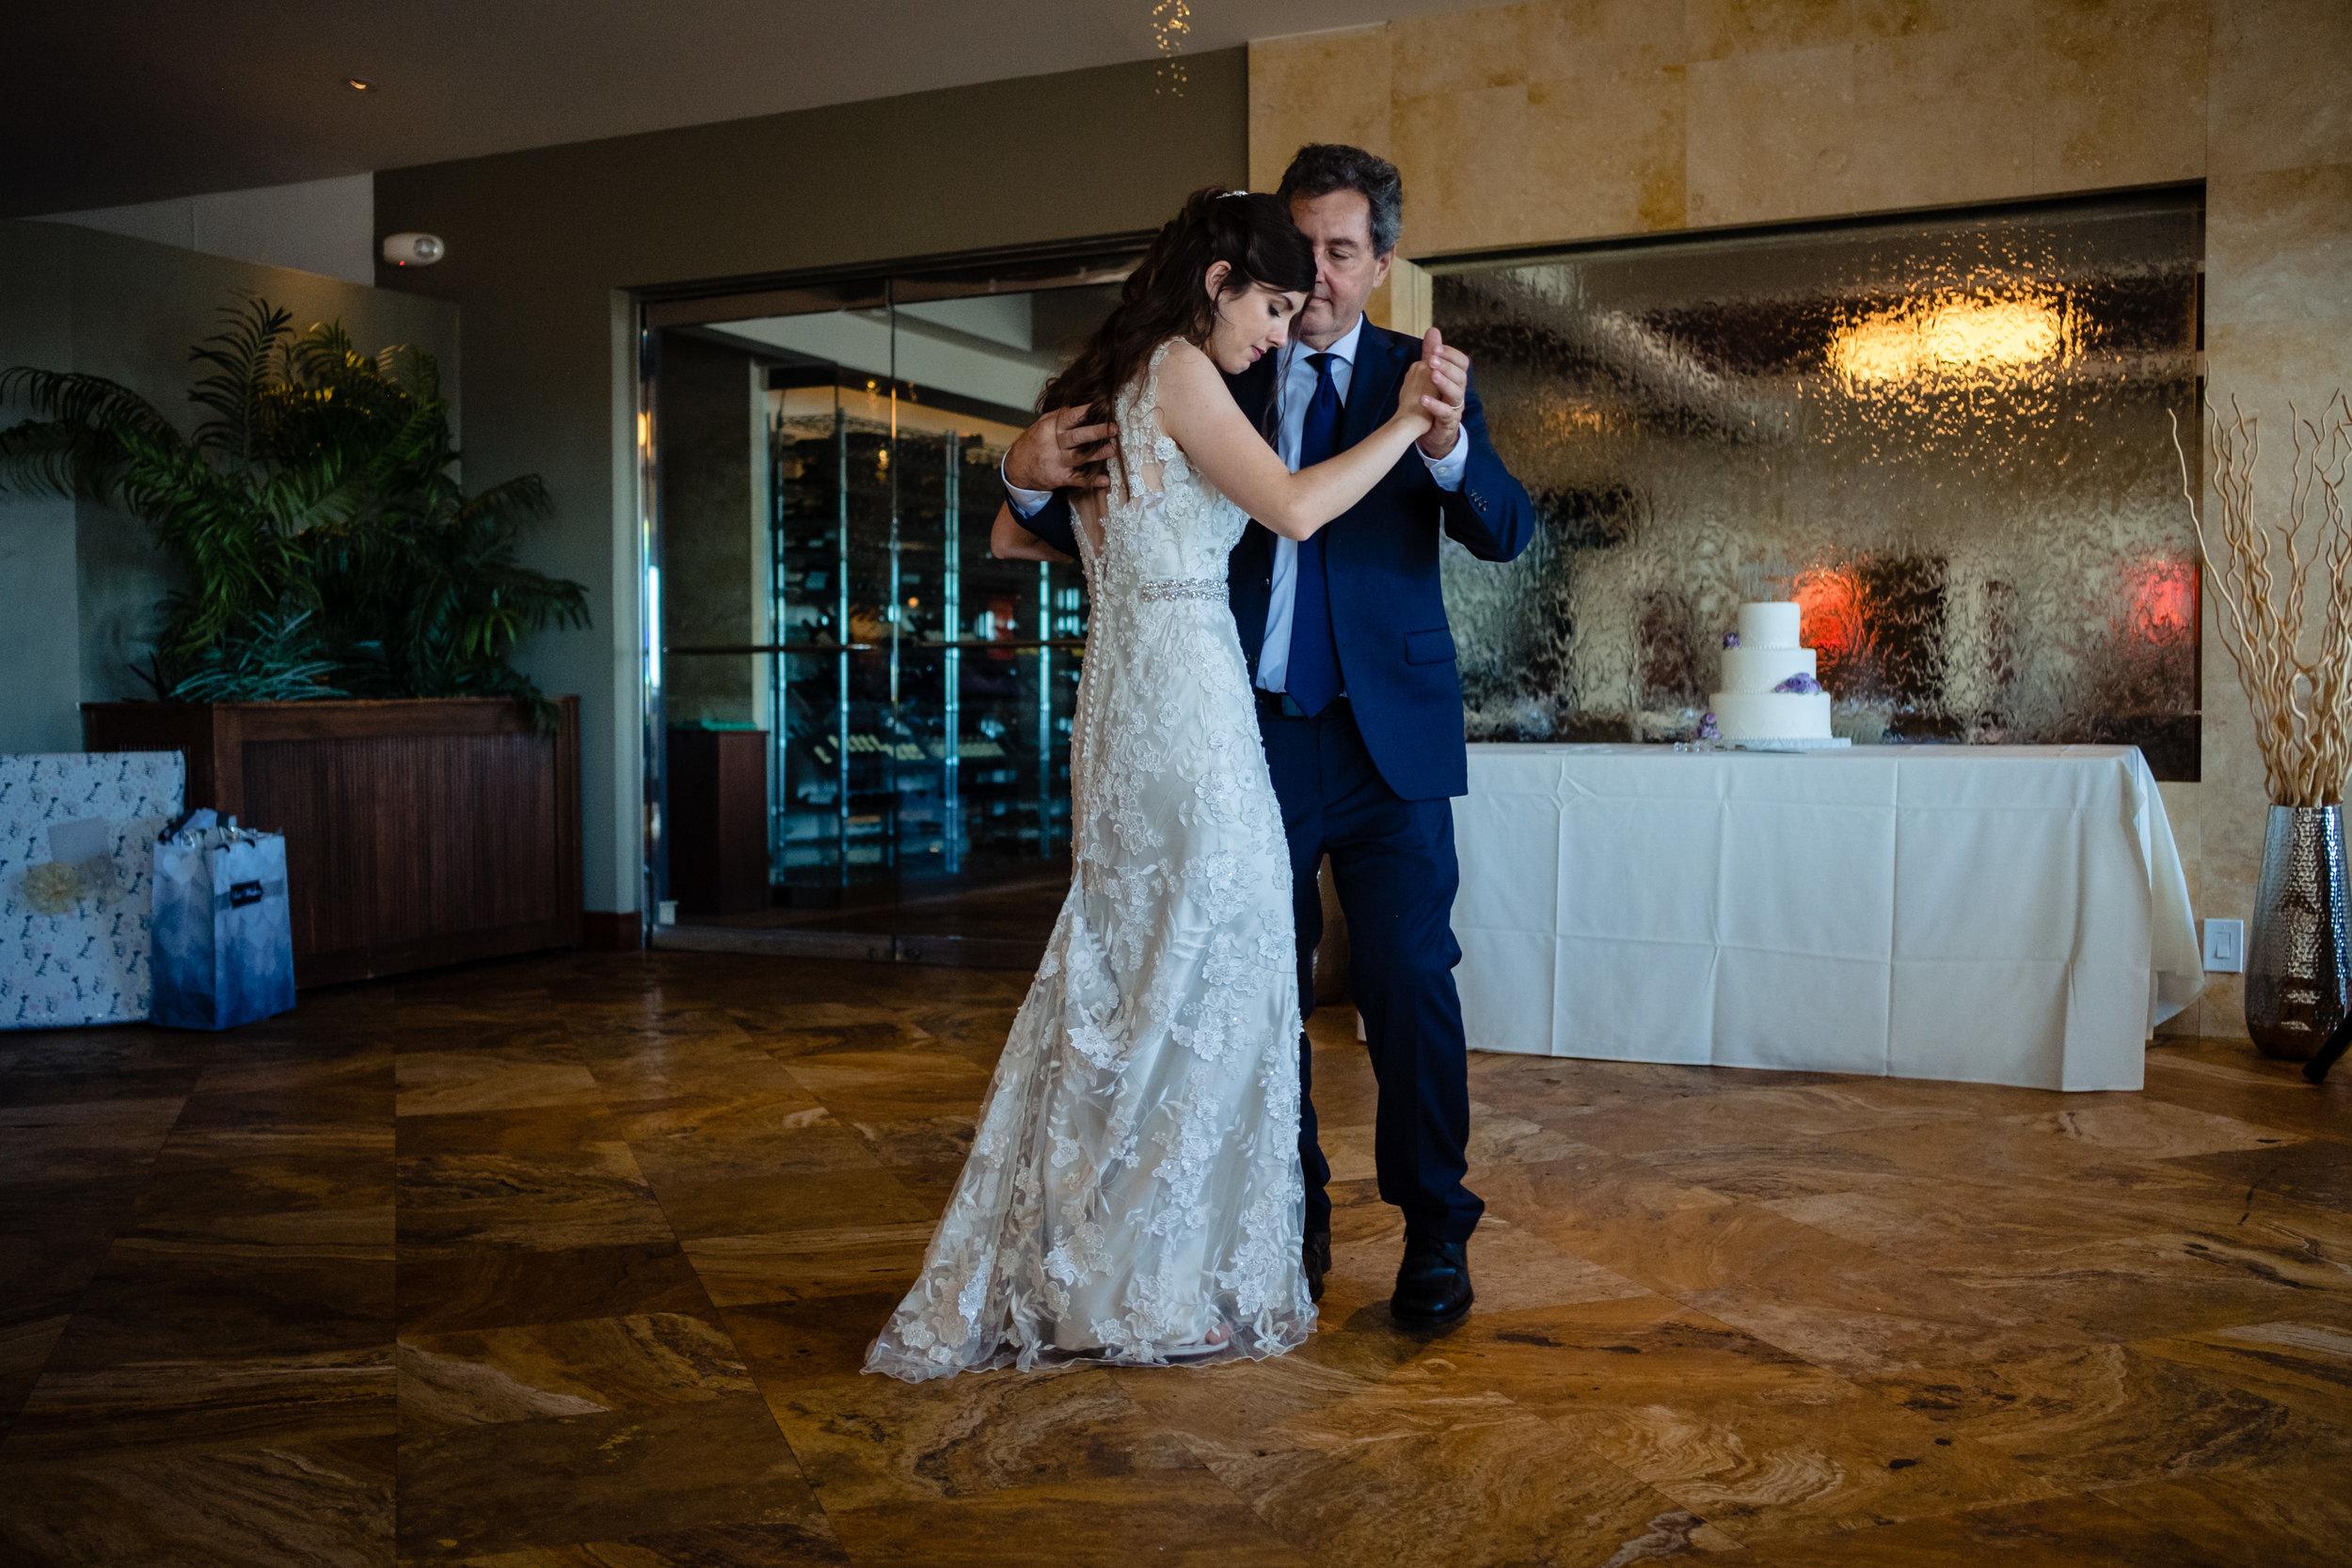 HAH_Zoe and Daniel_Clearwater Wedding_409_2018.jpg